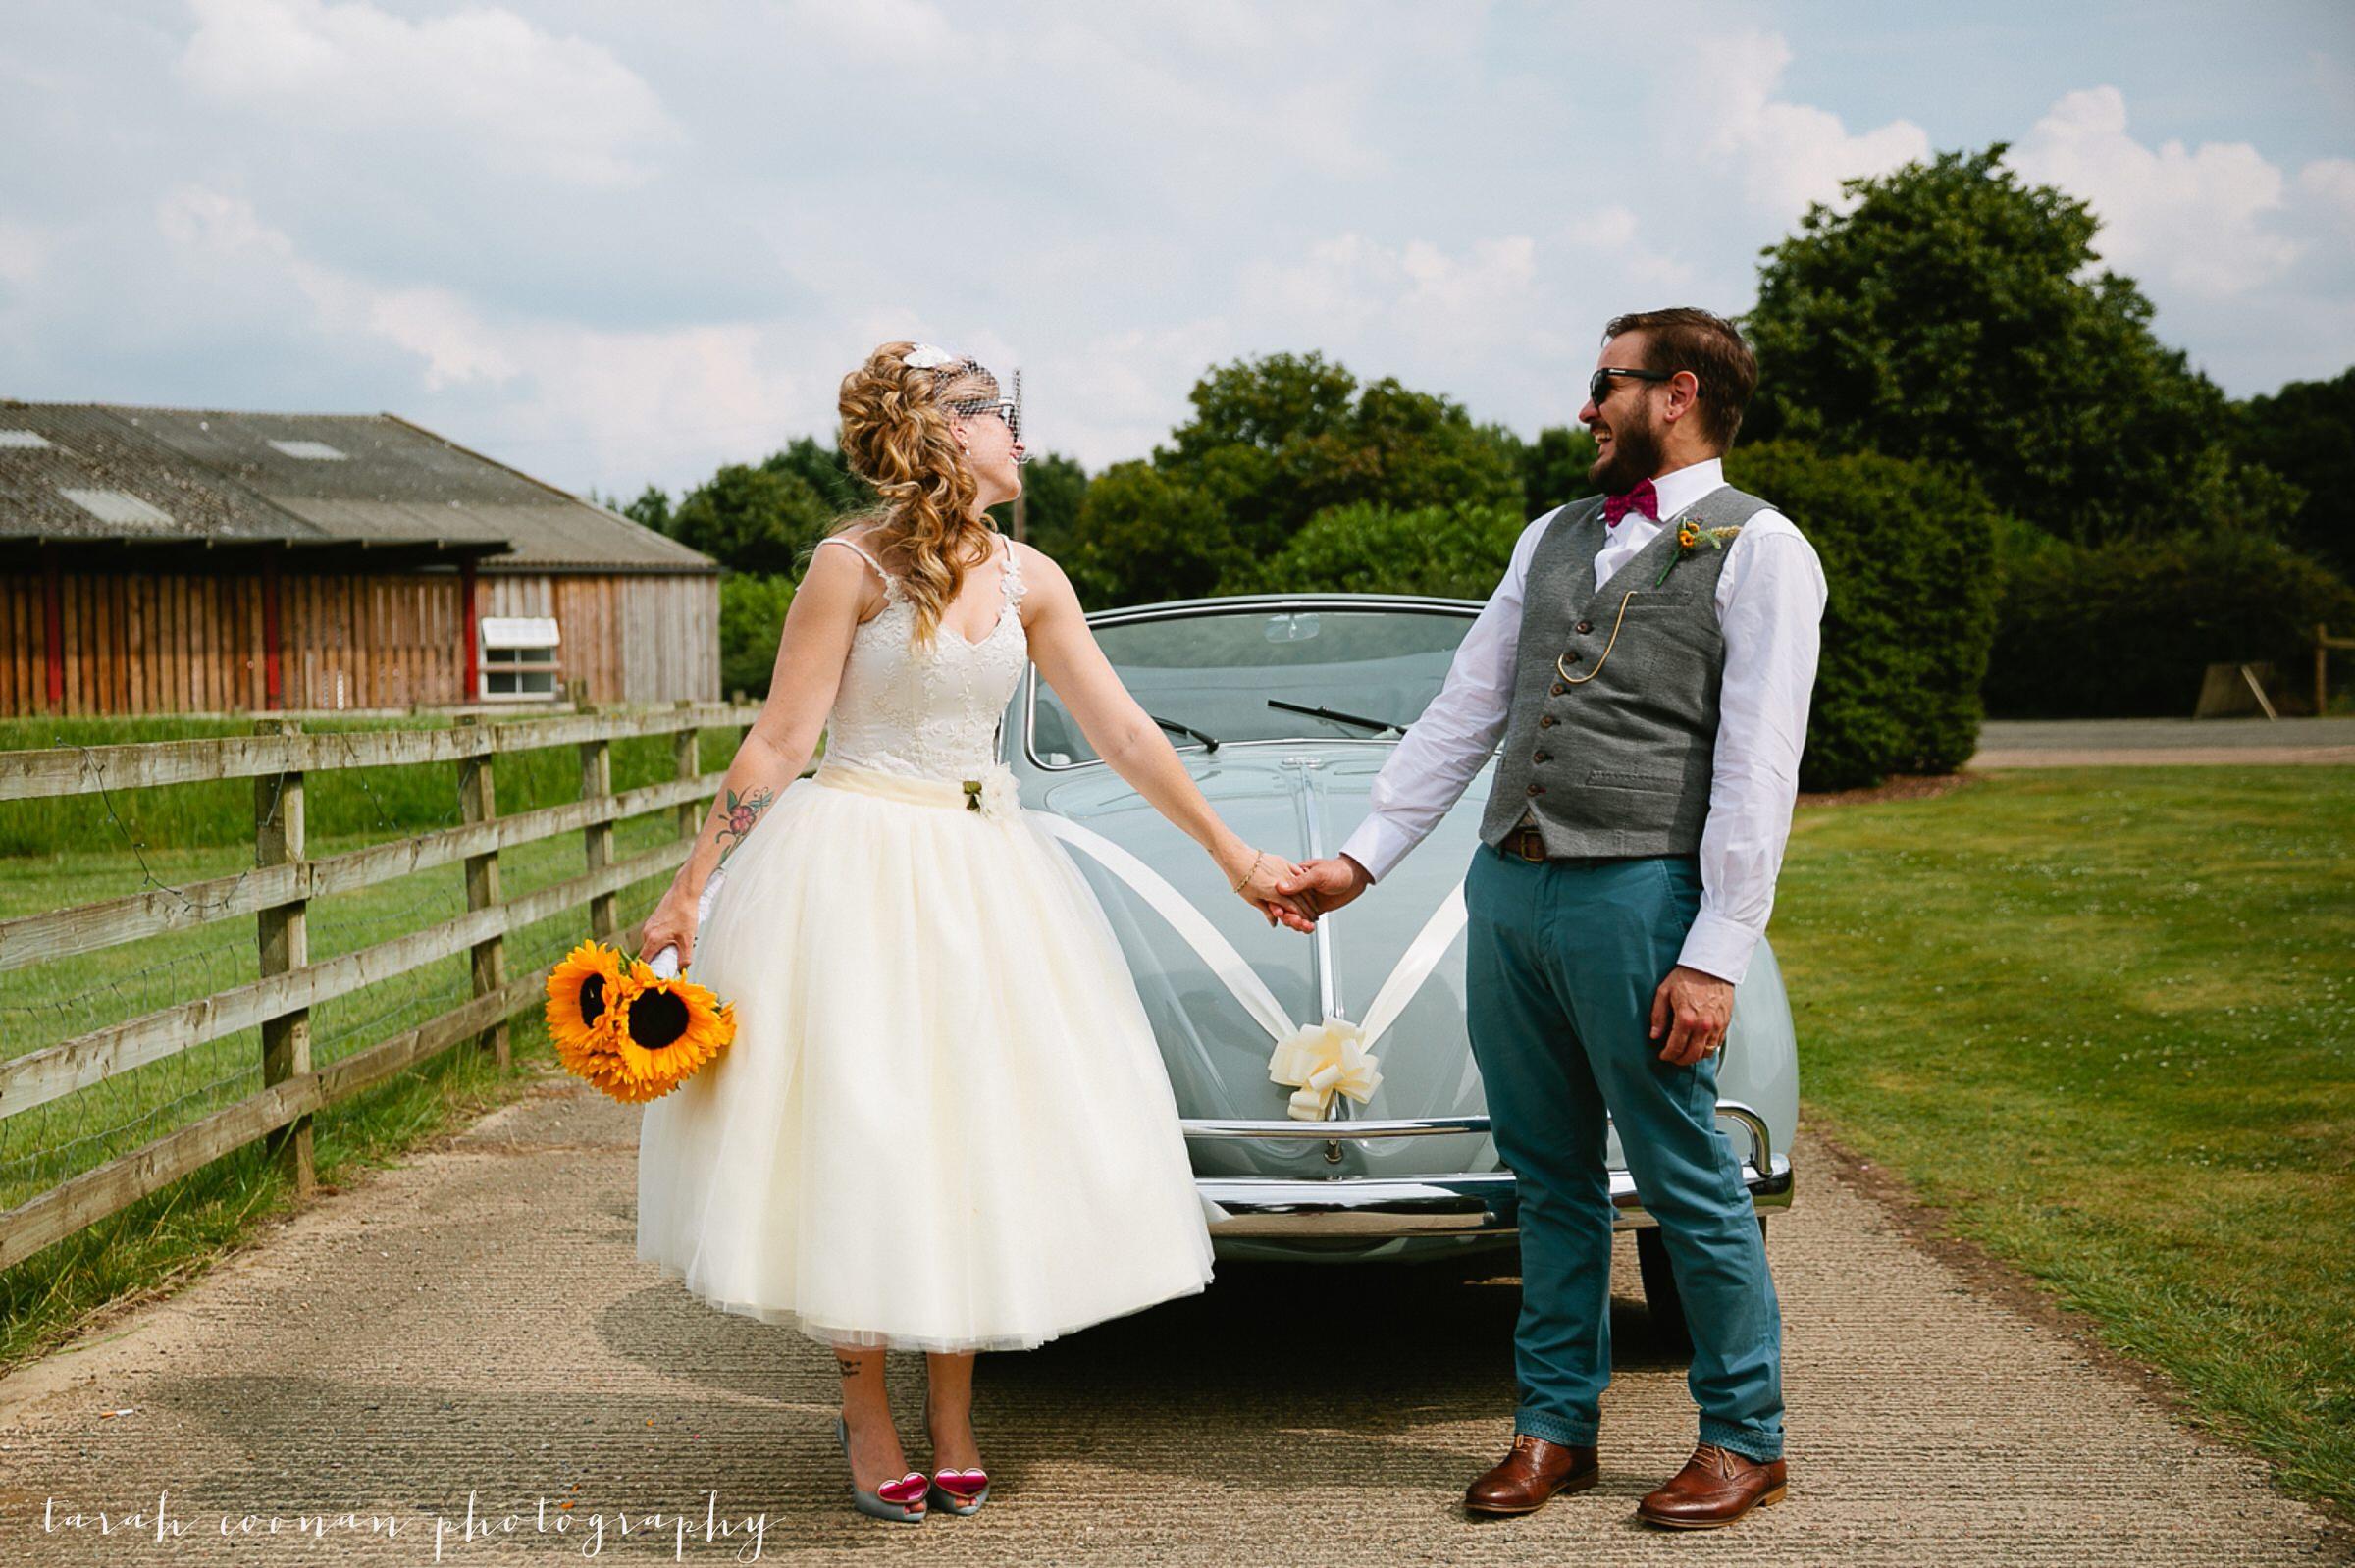 brighton-wedding-photographer63